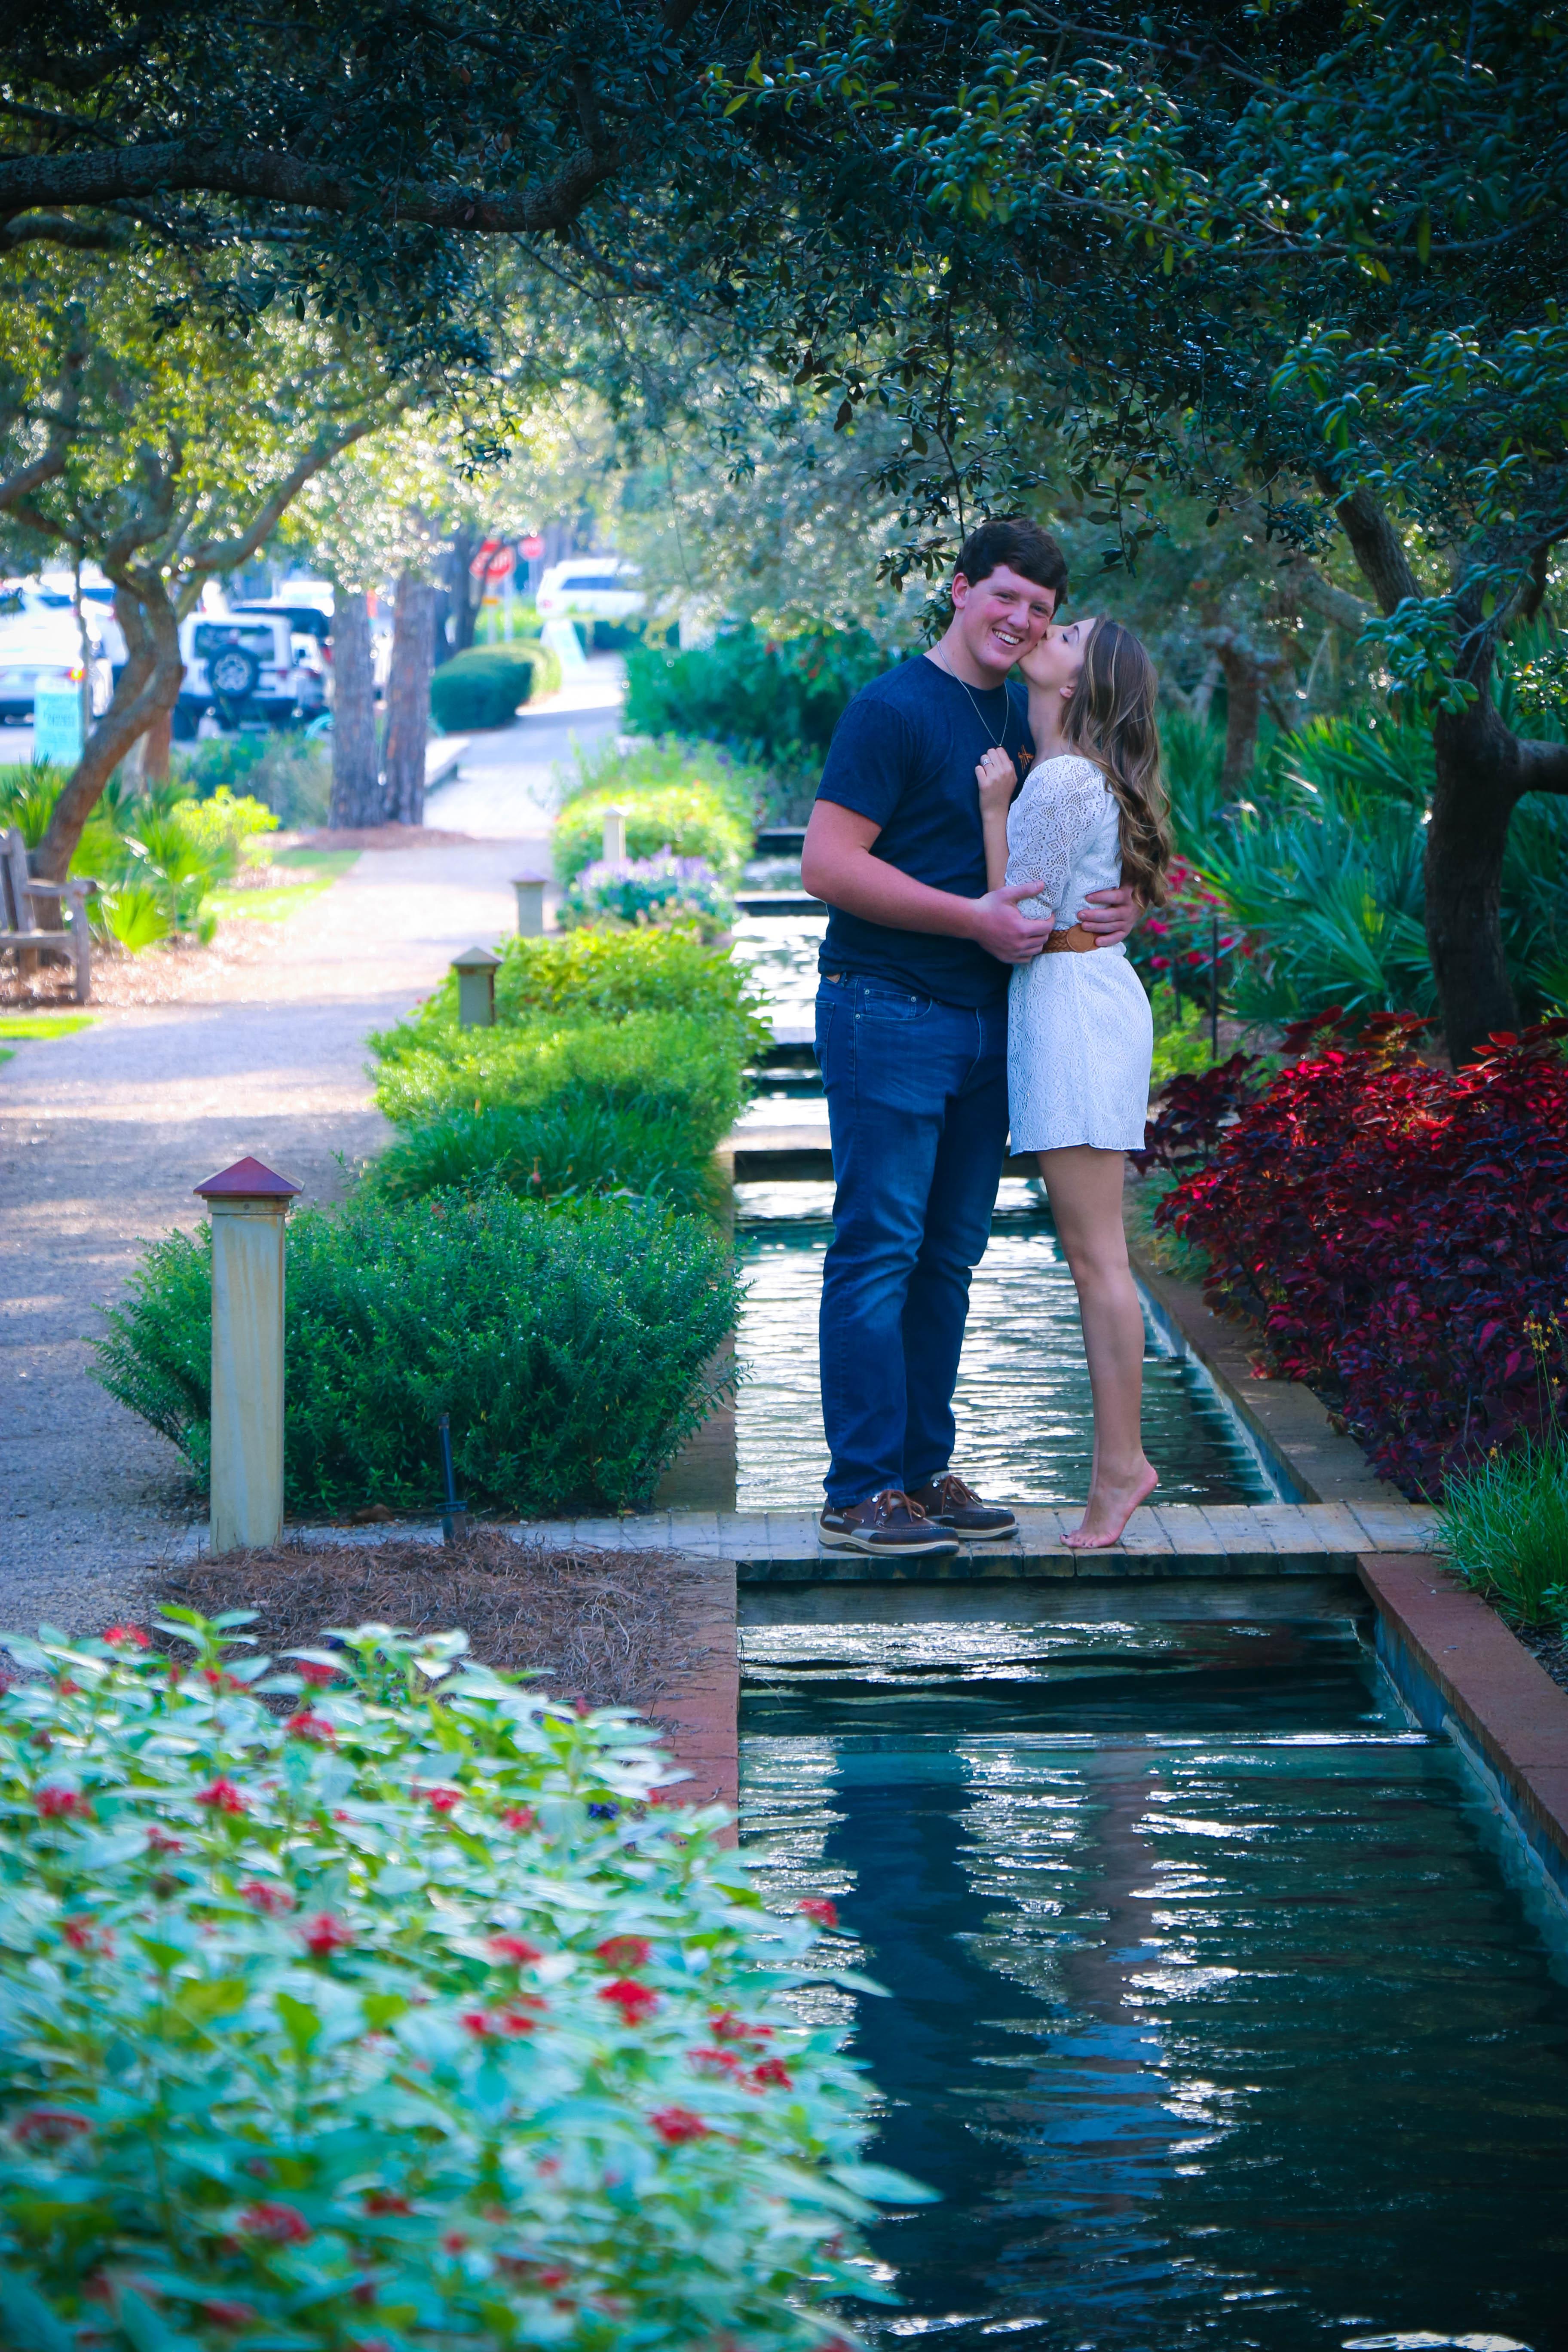 Woman And Man Standing On Bridge Kissing 183 Free Stock Photo